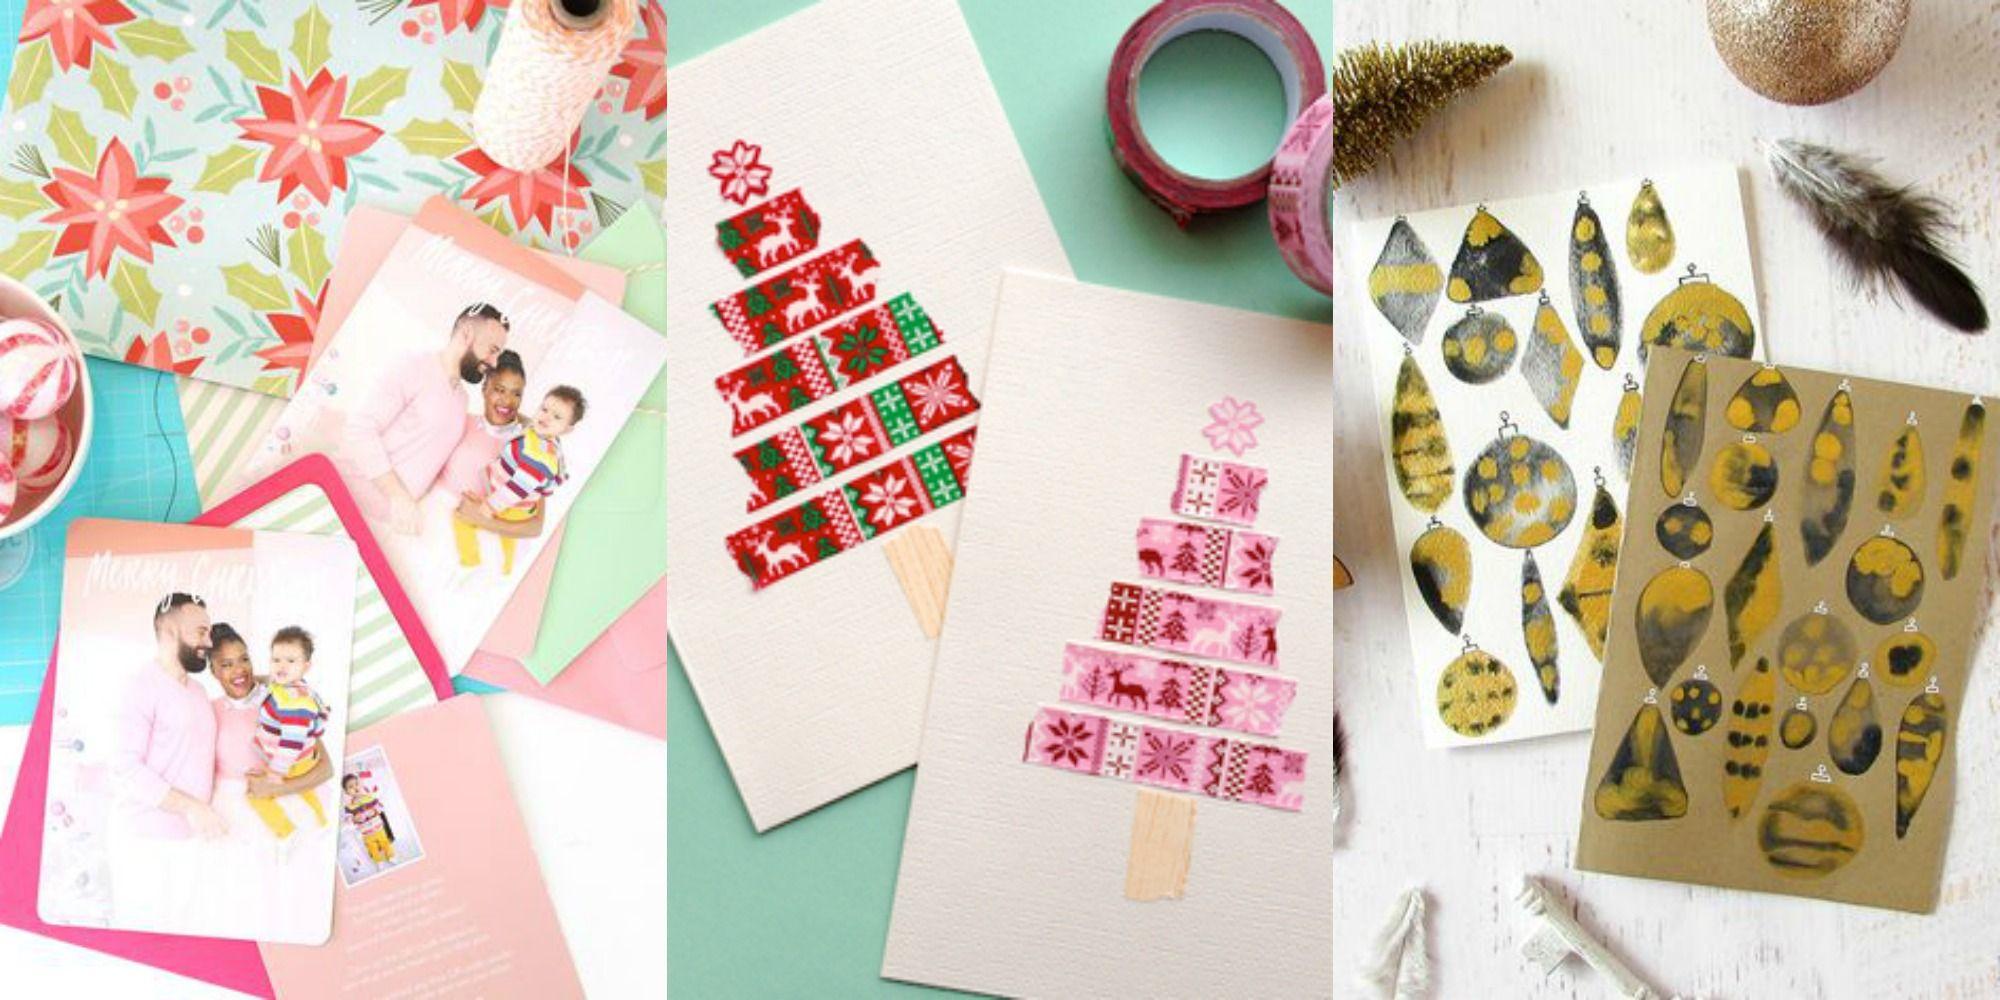 36 Diy Christmas Cards How To Make Homemade Holiday Cards